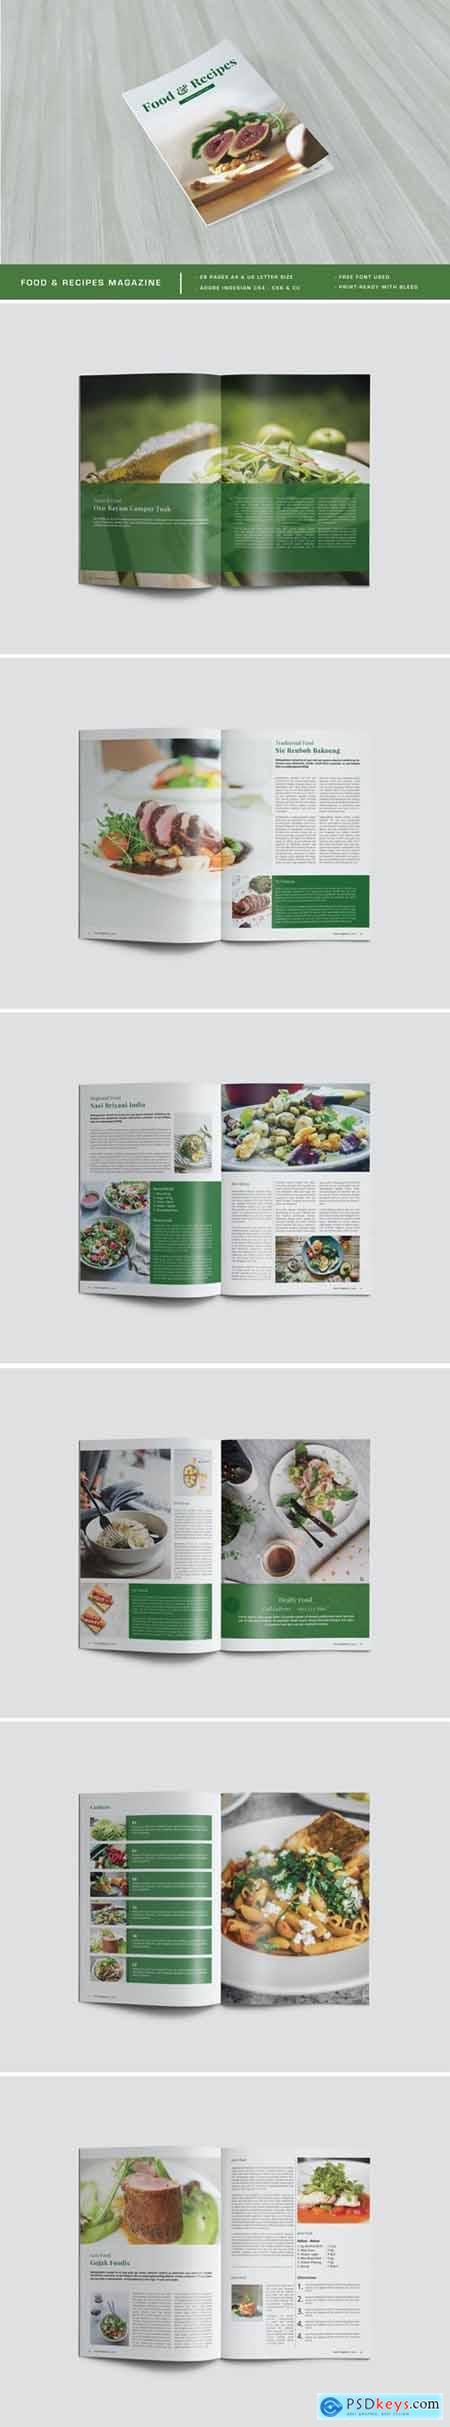 Food & Recipes Magazine